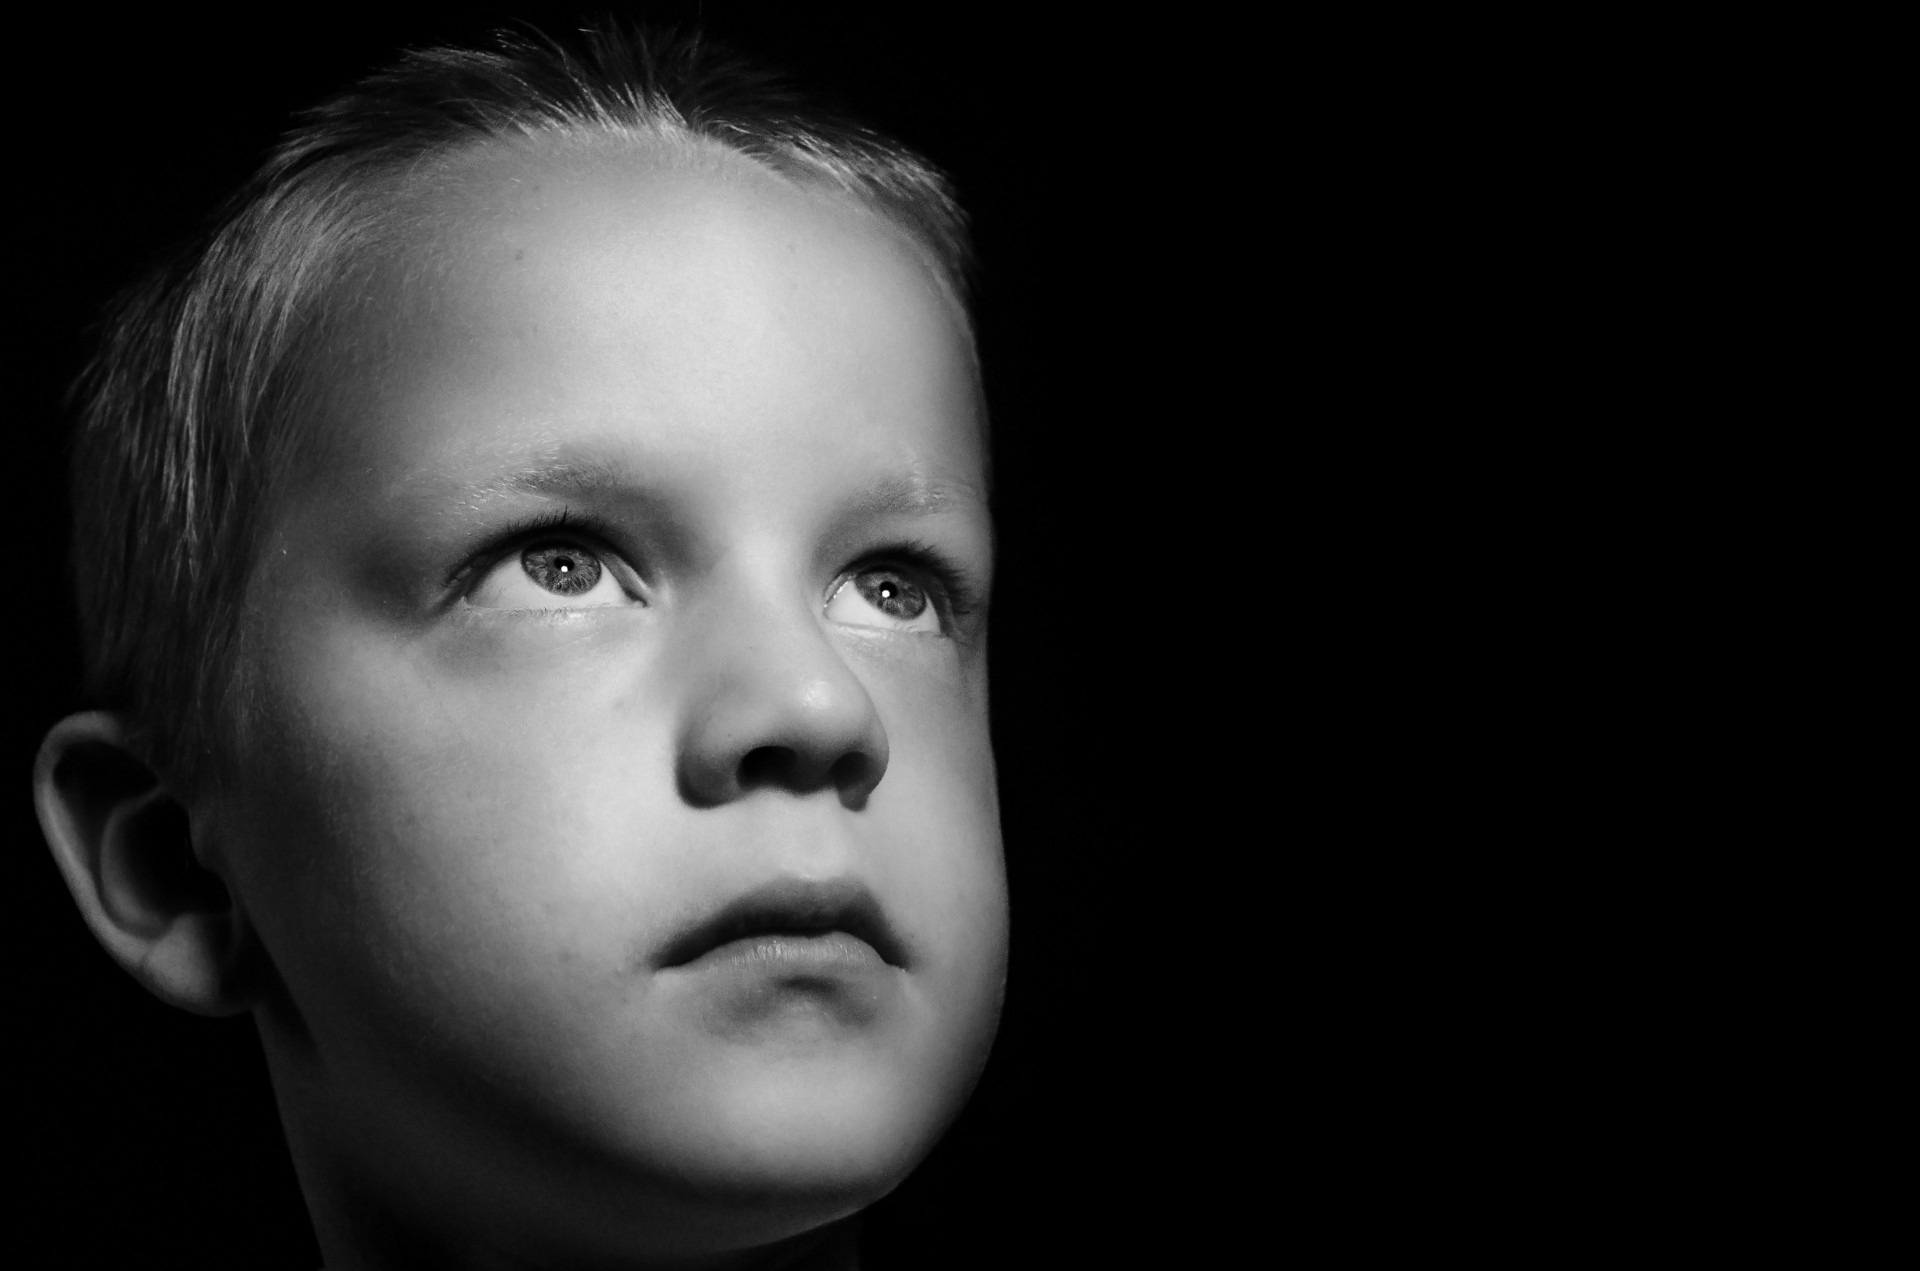 sad-child-1374392232nwk